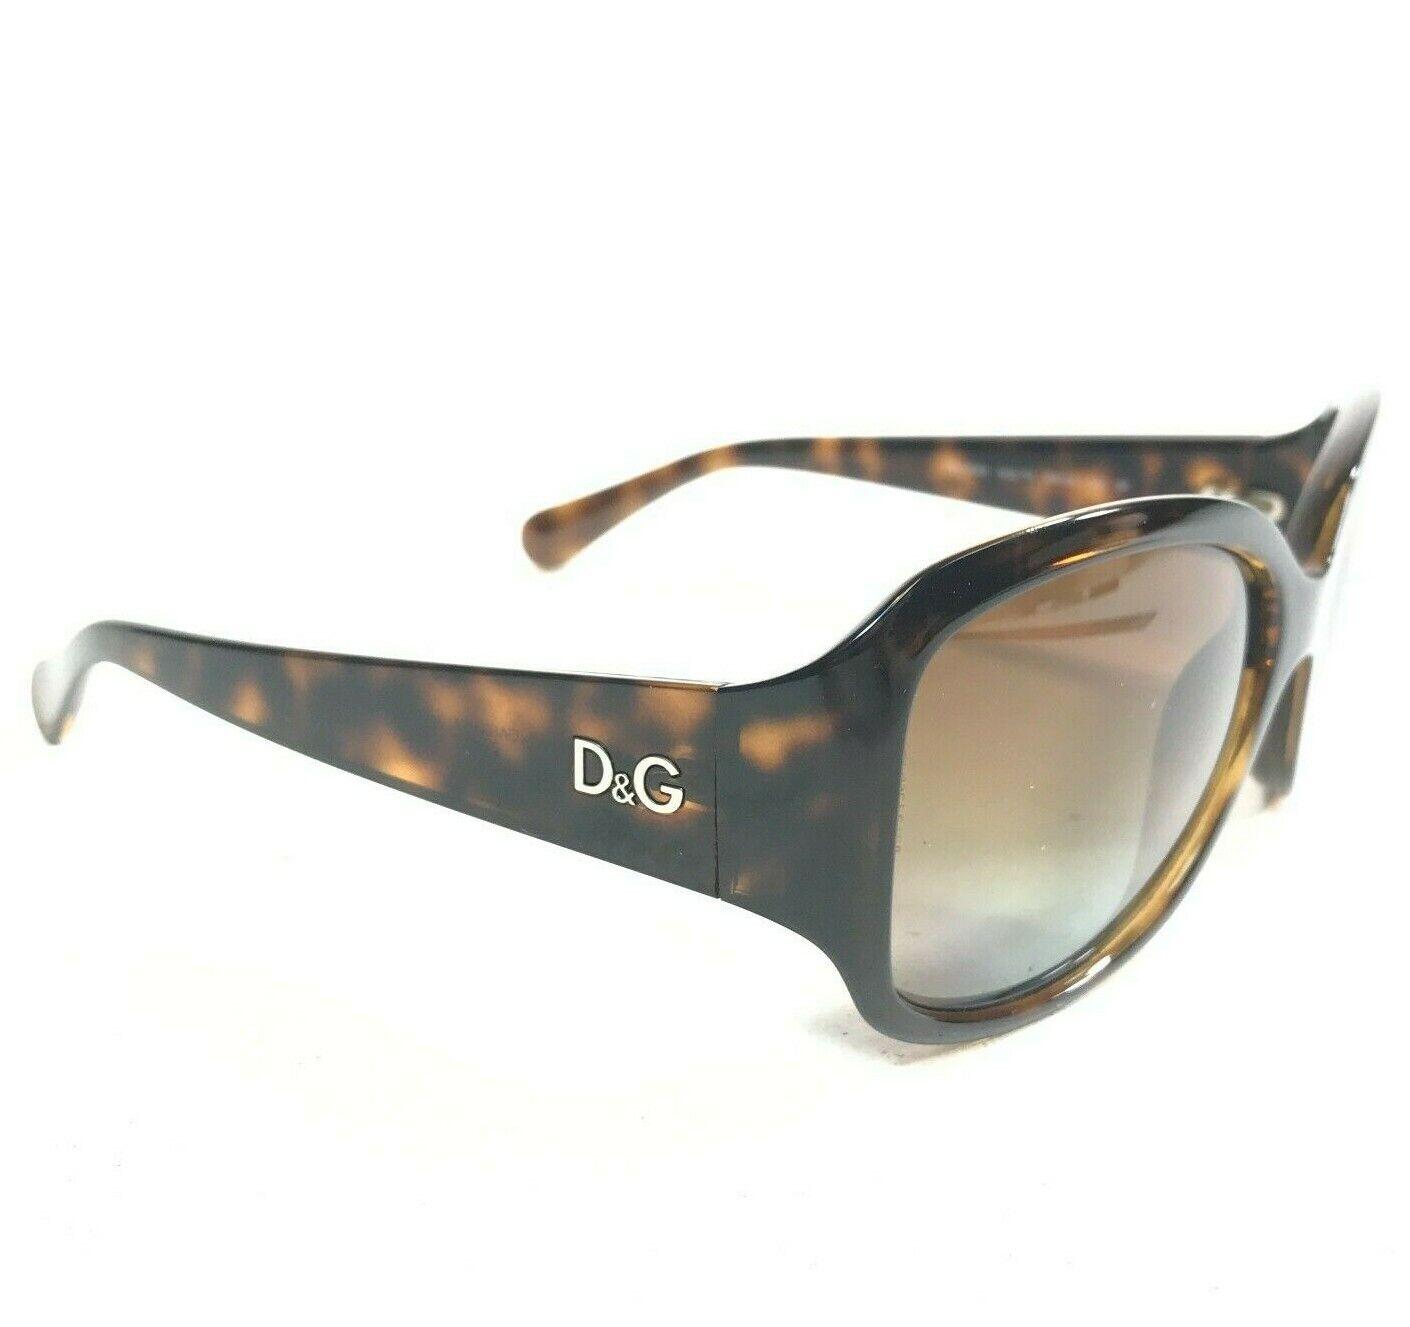 Dolce & Gabbana Sunglasses DD8065 502/T5 Butterfly Brown Tortoise Frames 125 2